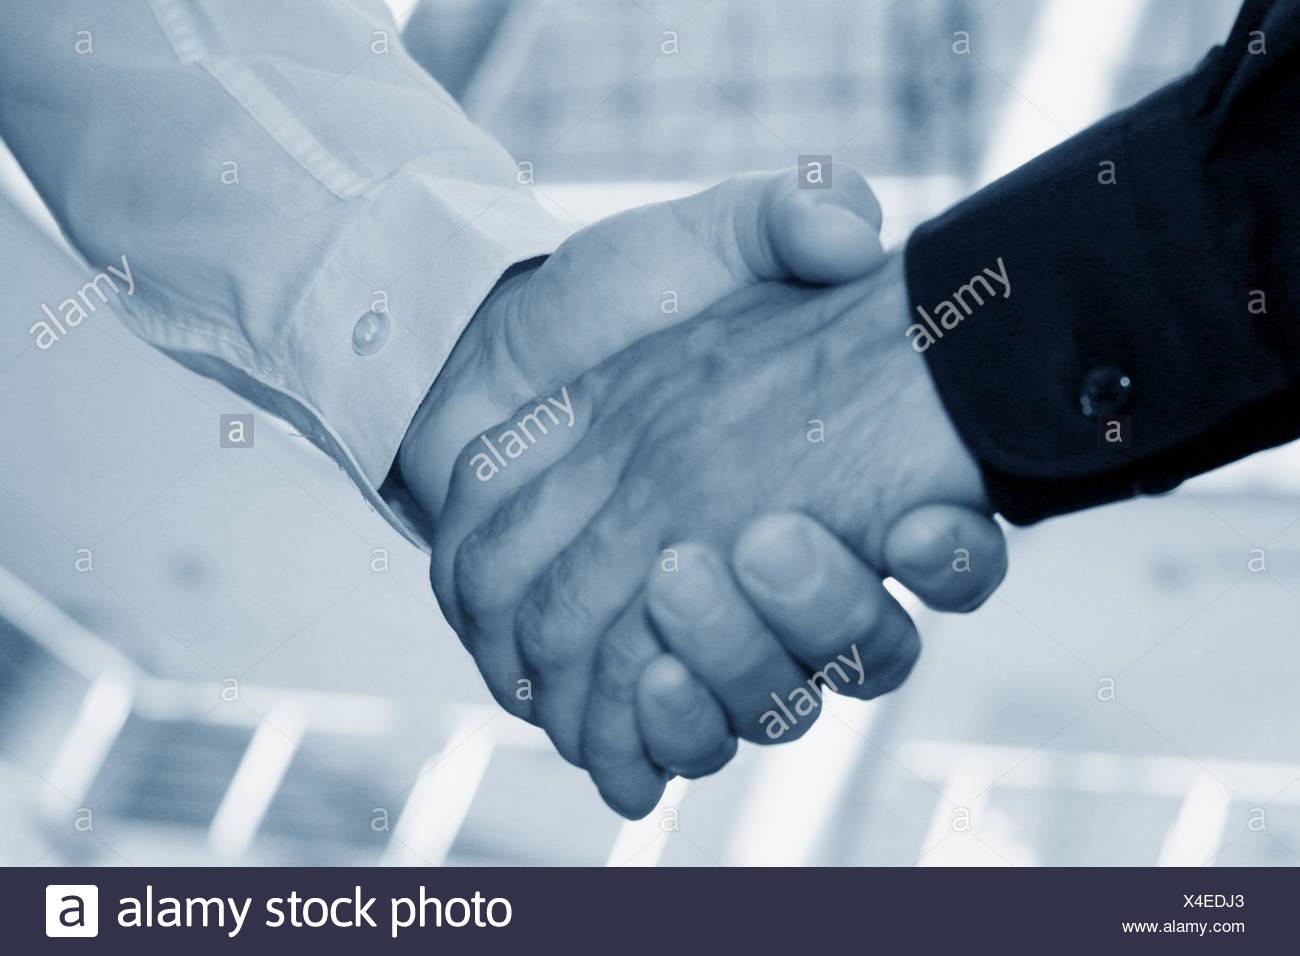 2 black men shaking hands stock photos 2 black men shaking hands